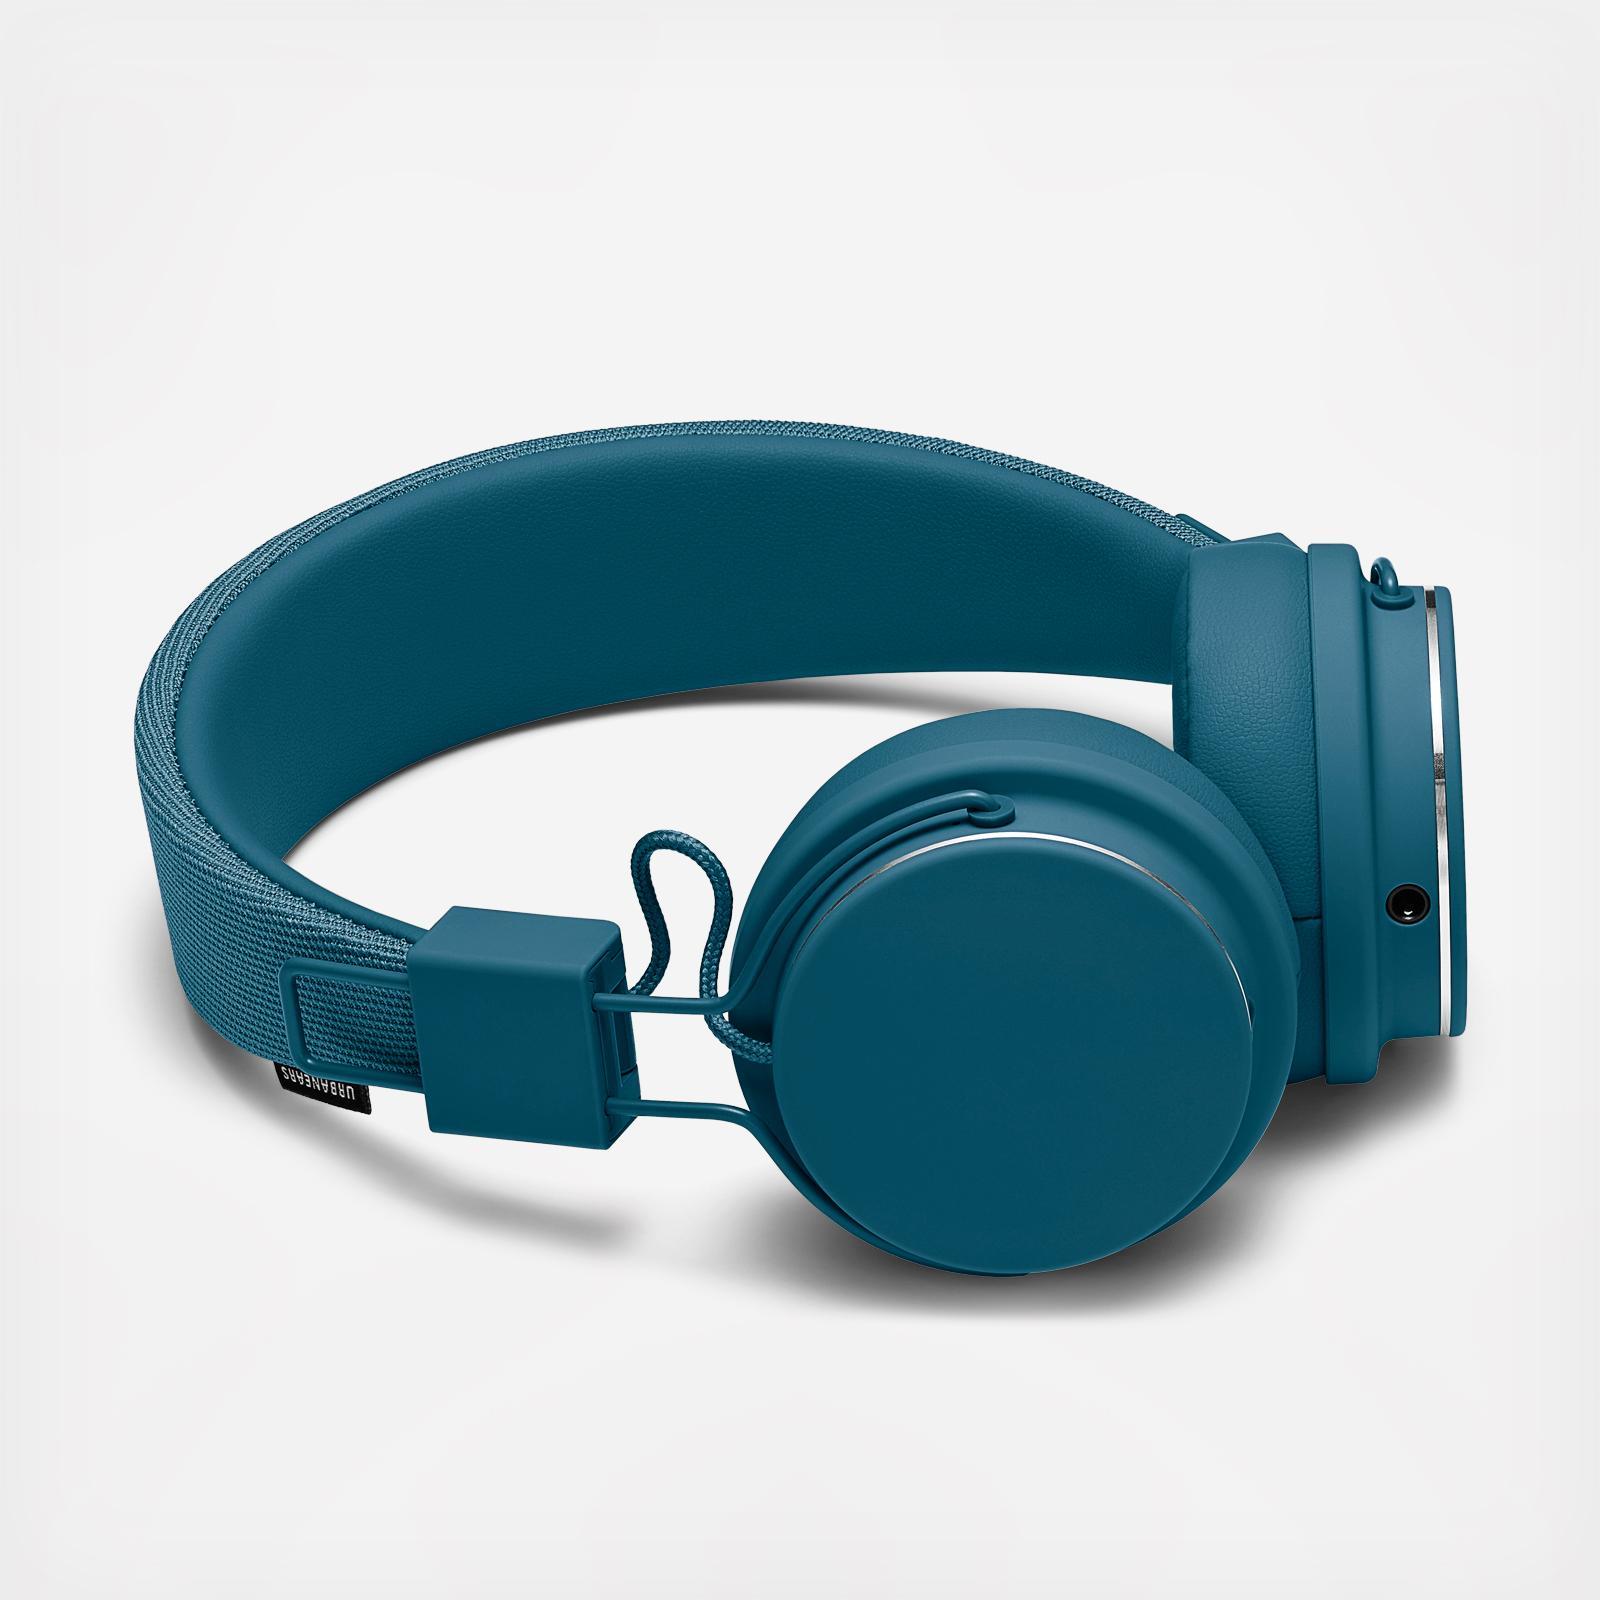 7340055330114 Ean Urbanears Plattan 2 On Ear Headphones Indigo By Ii Snow Blue 4999 Zolacom